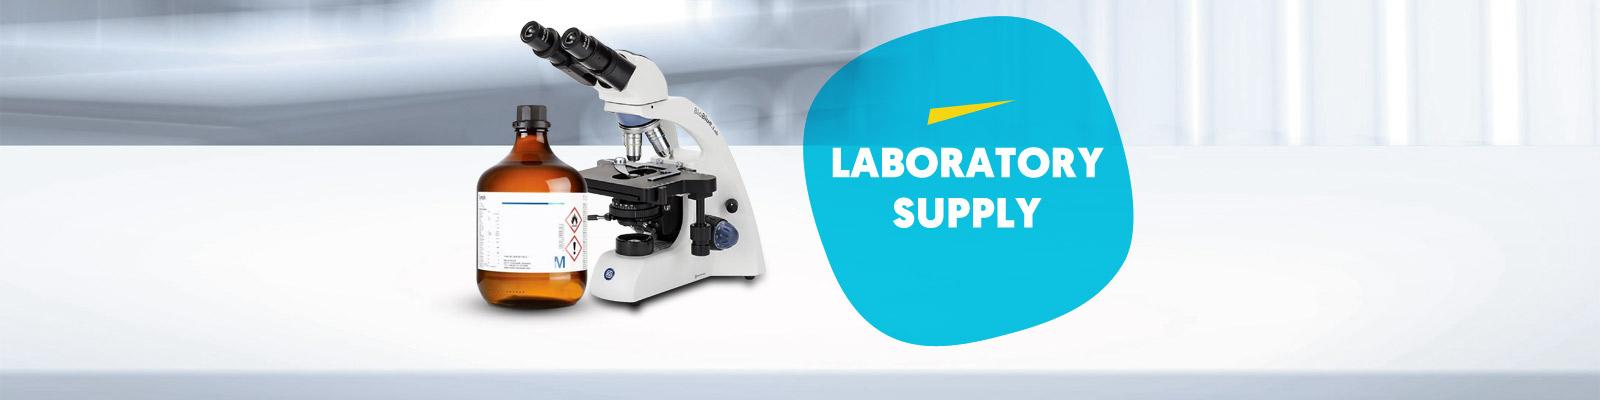 Laboratory Supply